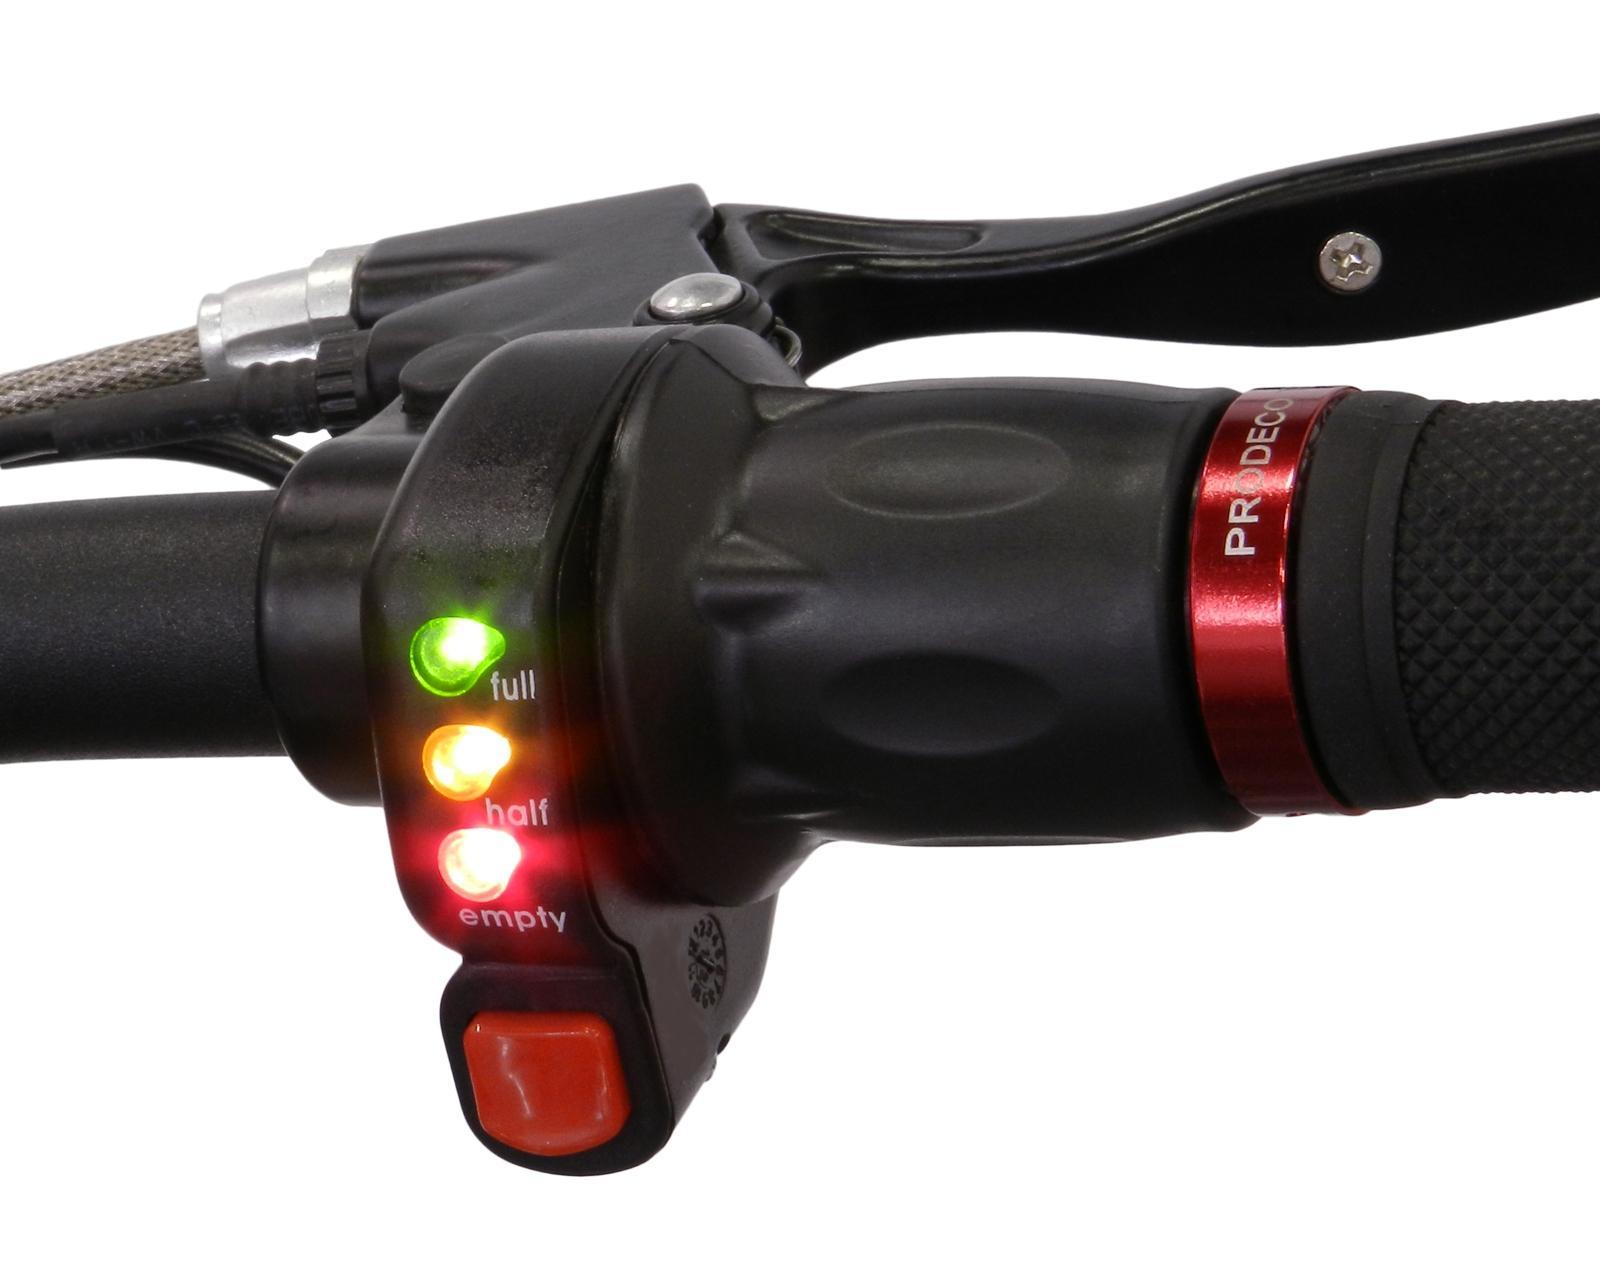 24V / 36V / 48V 전기 자동차 트위스트 스로틀 그립 전원 전압 LED 표시기 E- 자전거 변환 부품 DIY Ebike 속도 컨트롤러